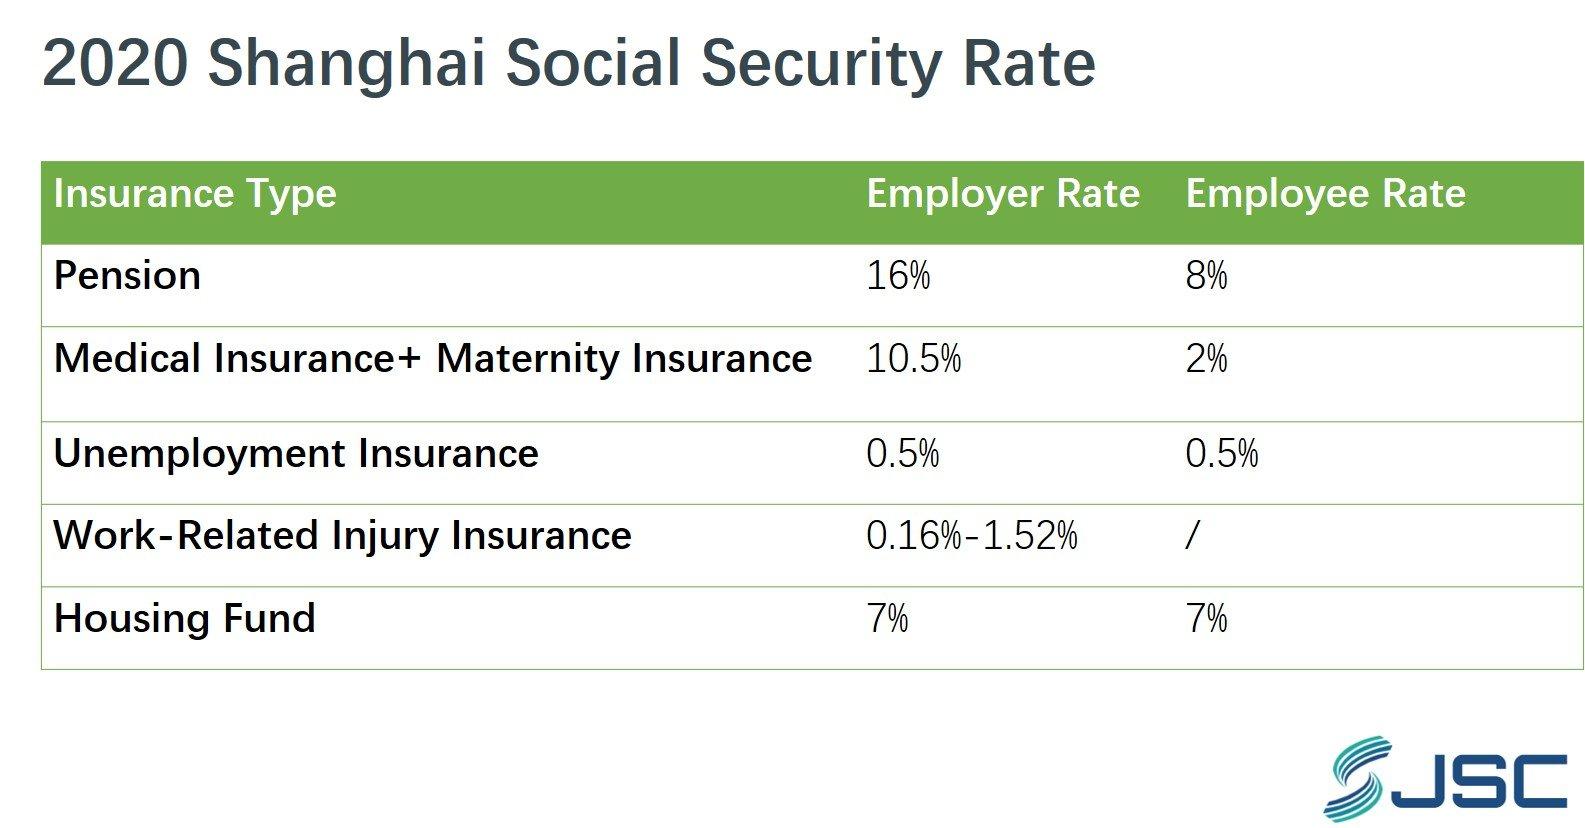 Shanghai social security rate